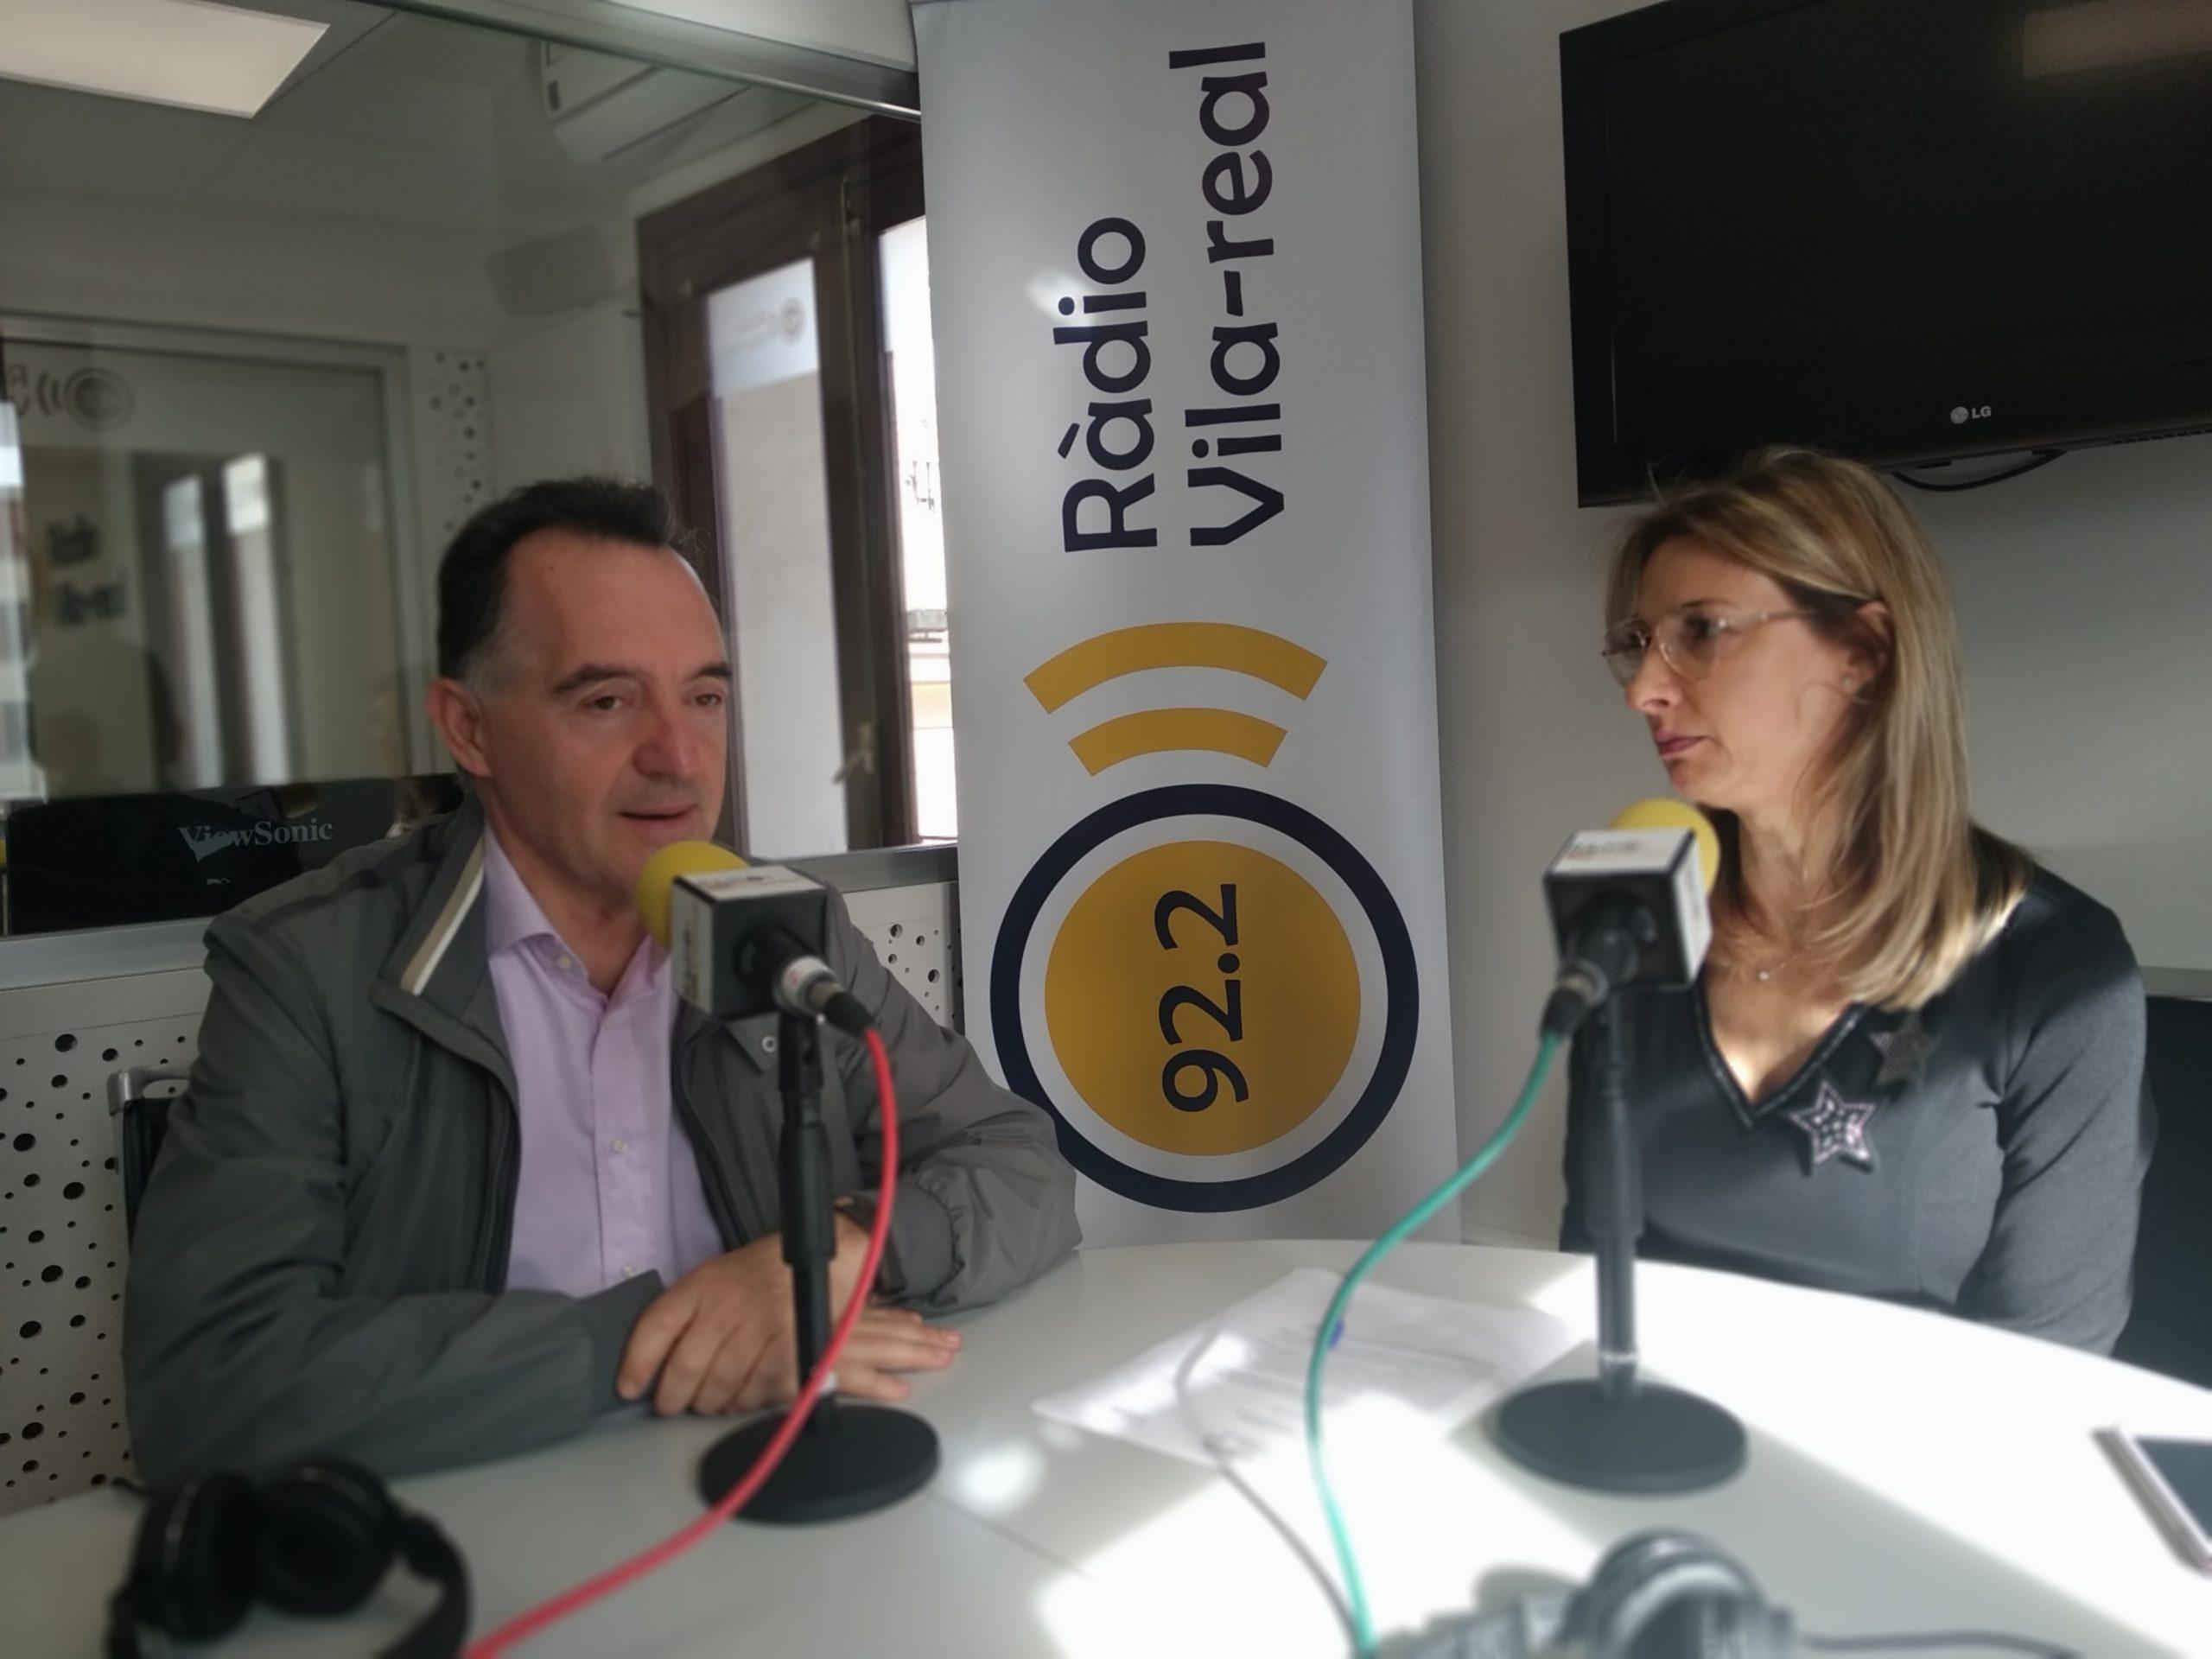 Entrevista al senador del PSPV por Castellón, Artemi Rallo